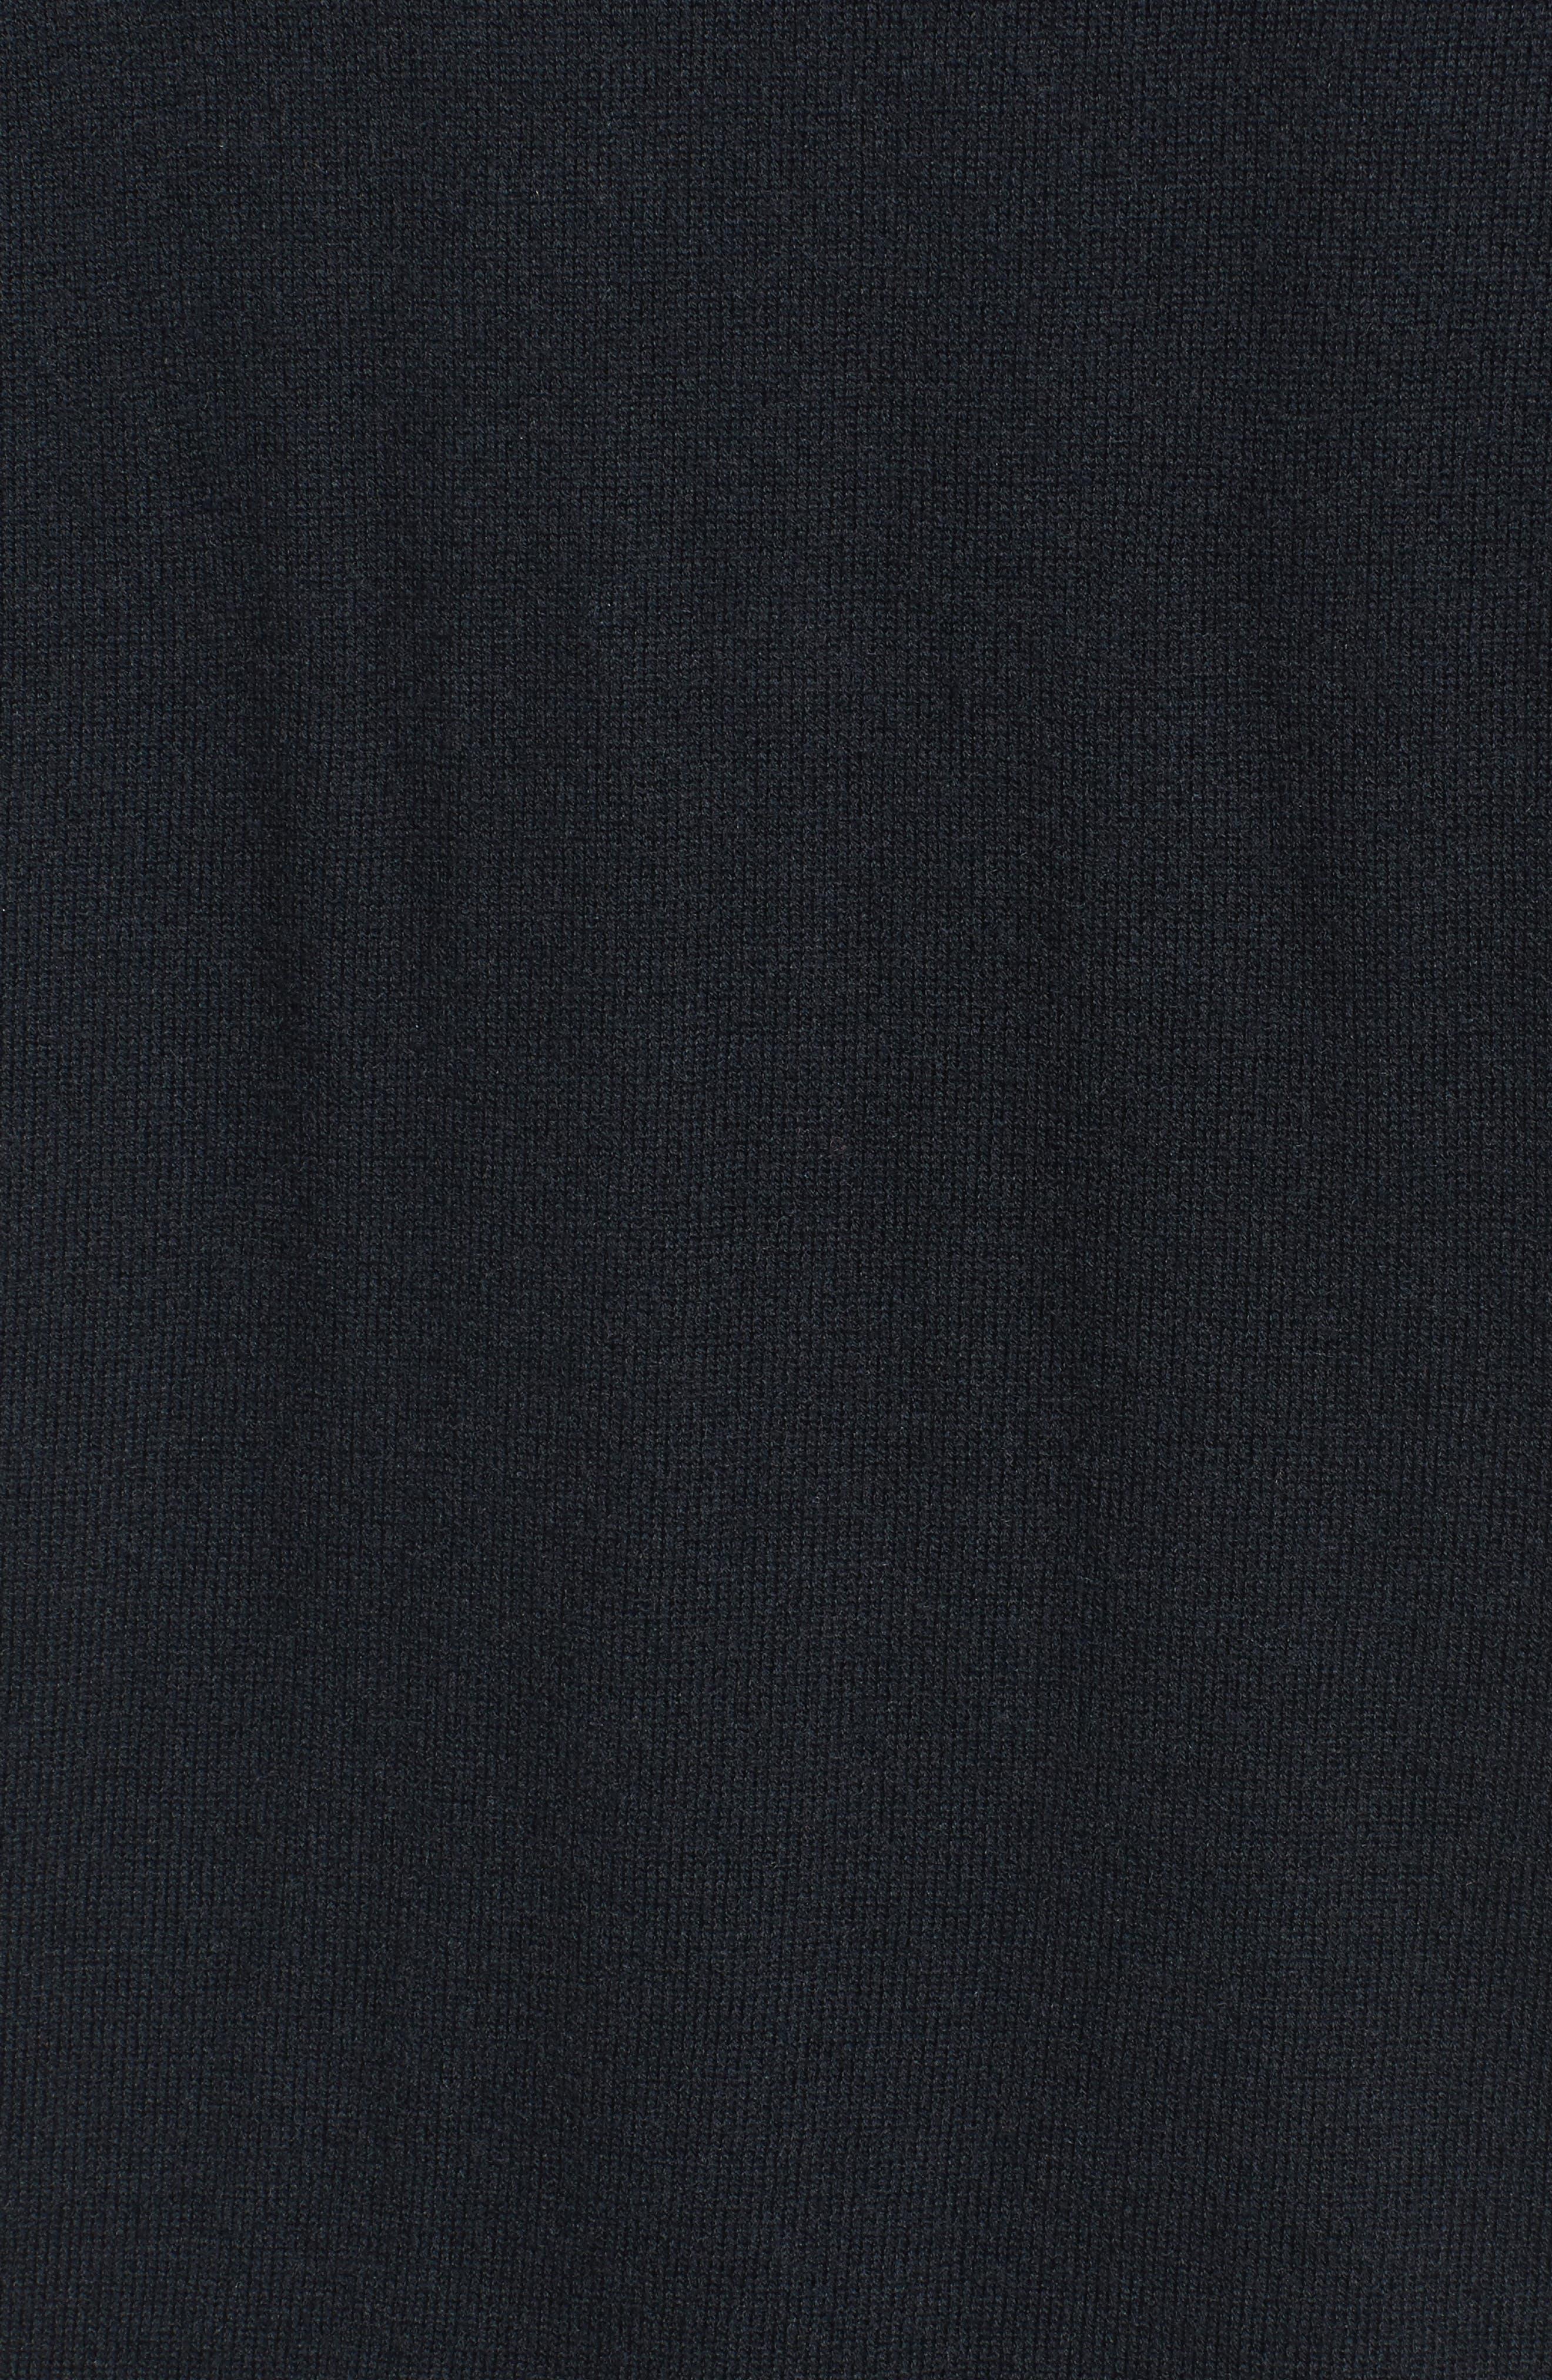 Spliced Tank Sweater,                             Alternate thumbnail 5, color,                             Black Combo